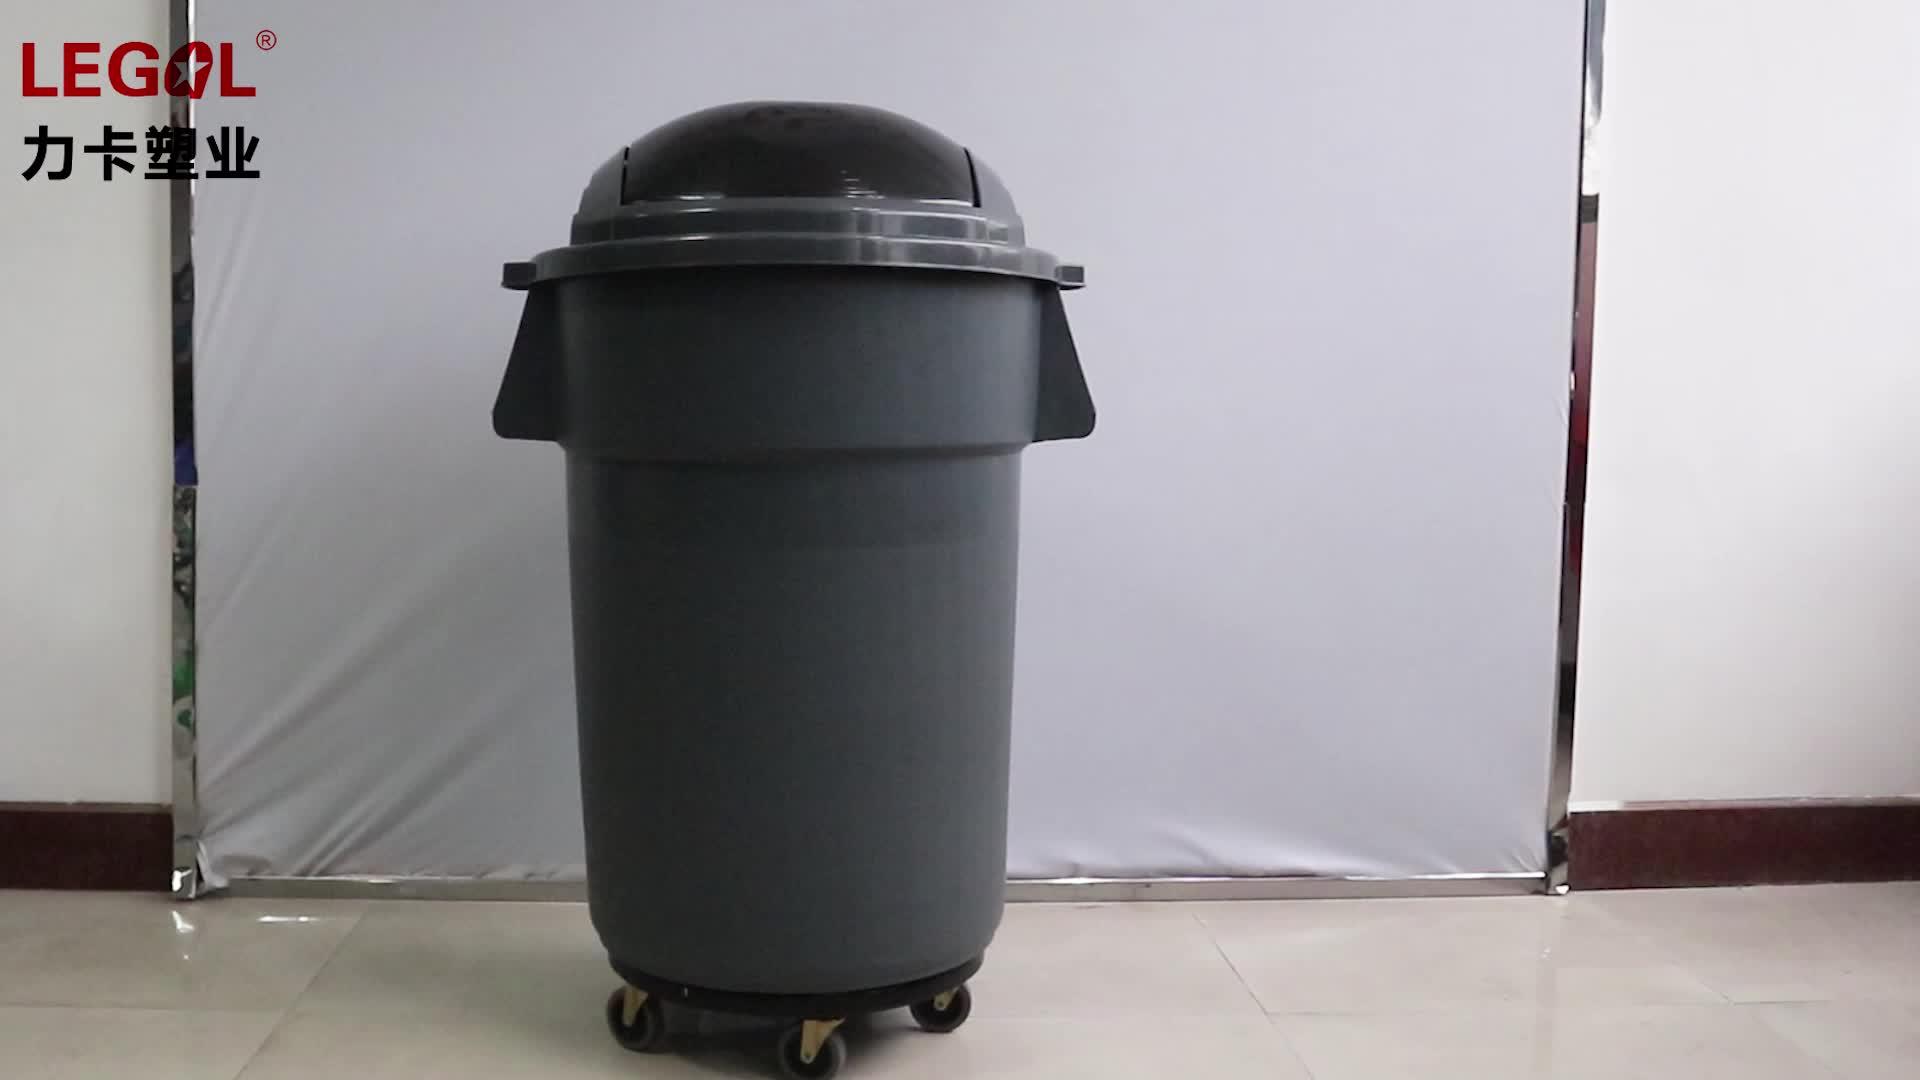 Environmentally friendly good quality recycling bin home